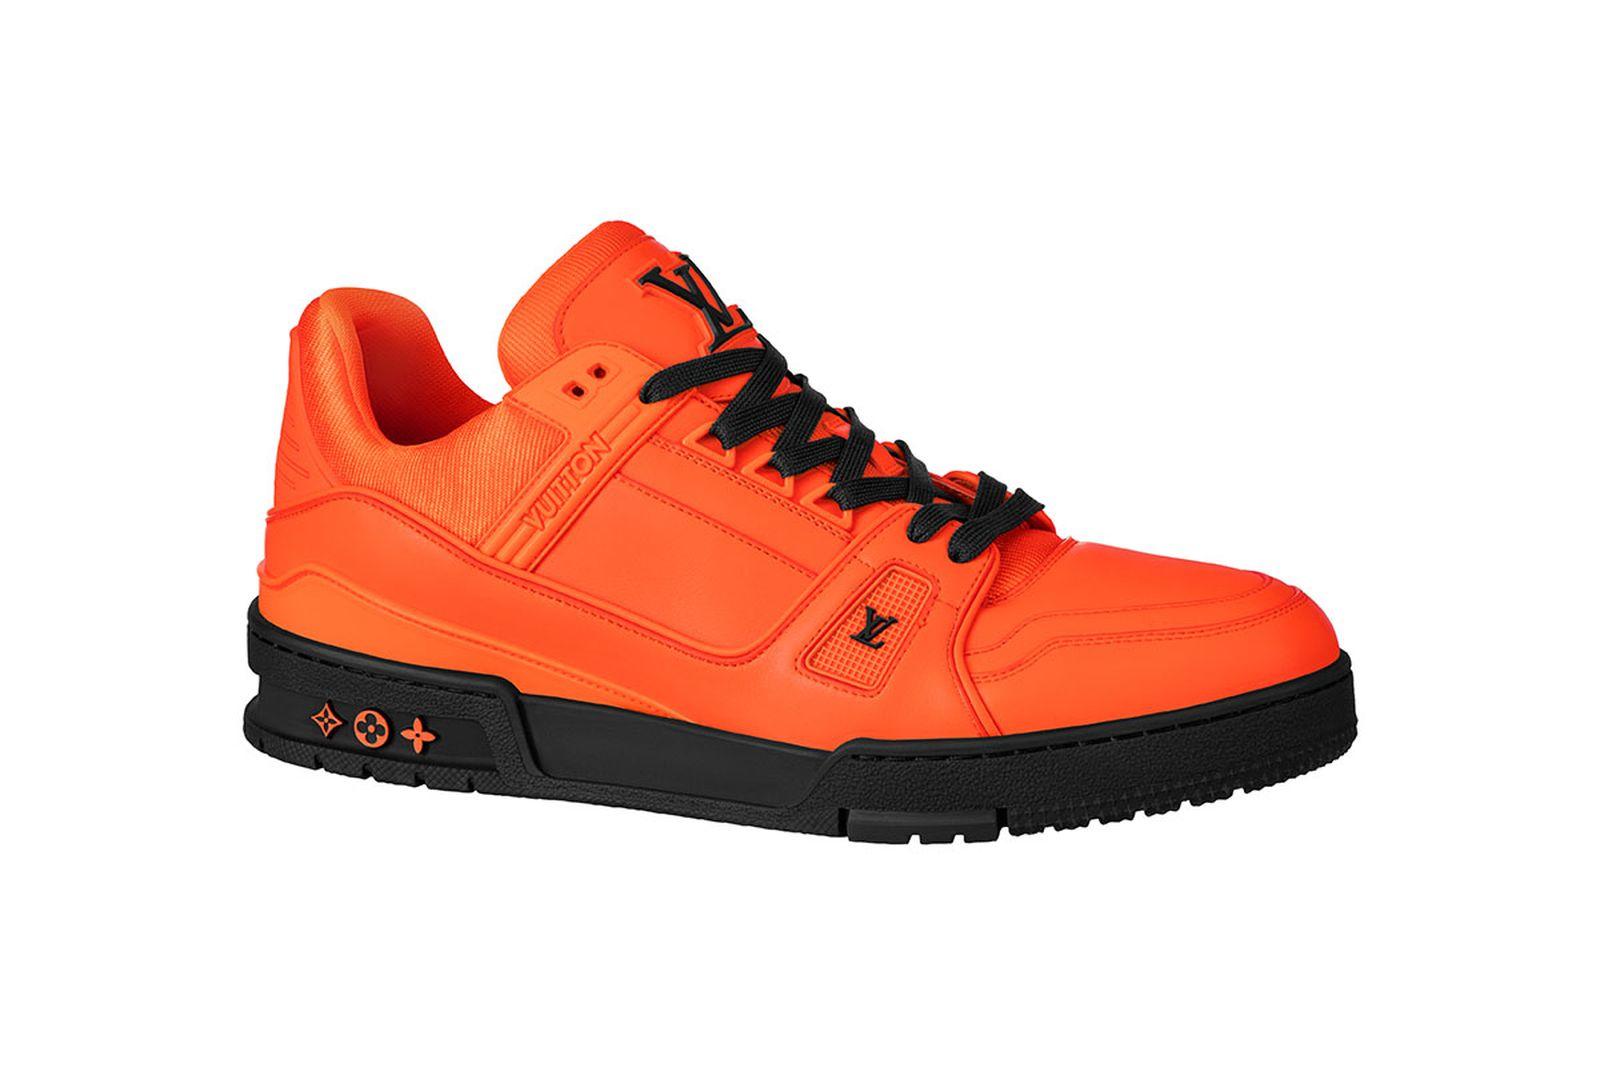 louis-vuitton-rainbow-outerwear-footwear-02